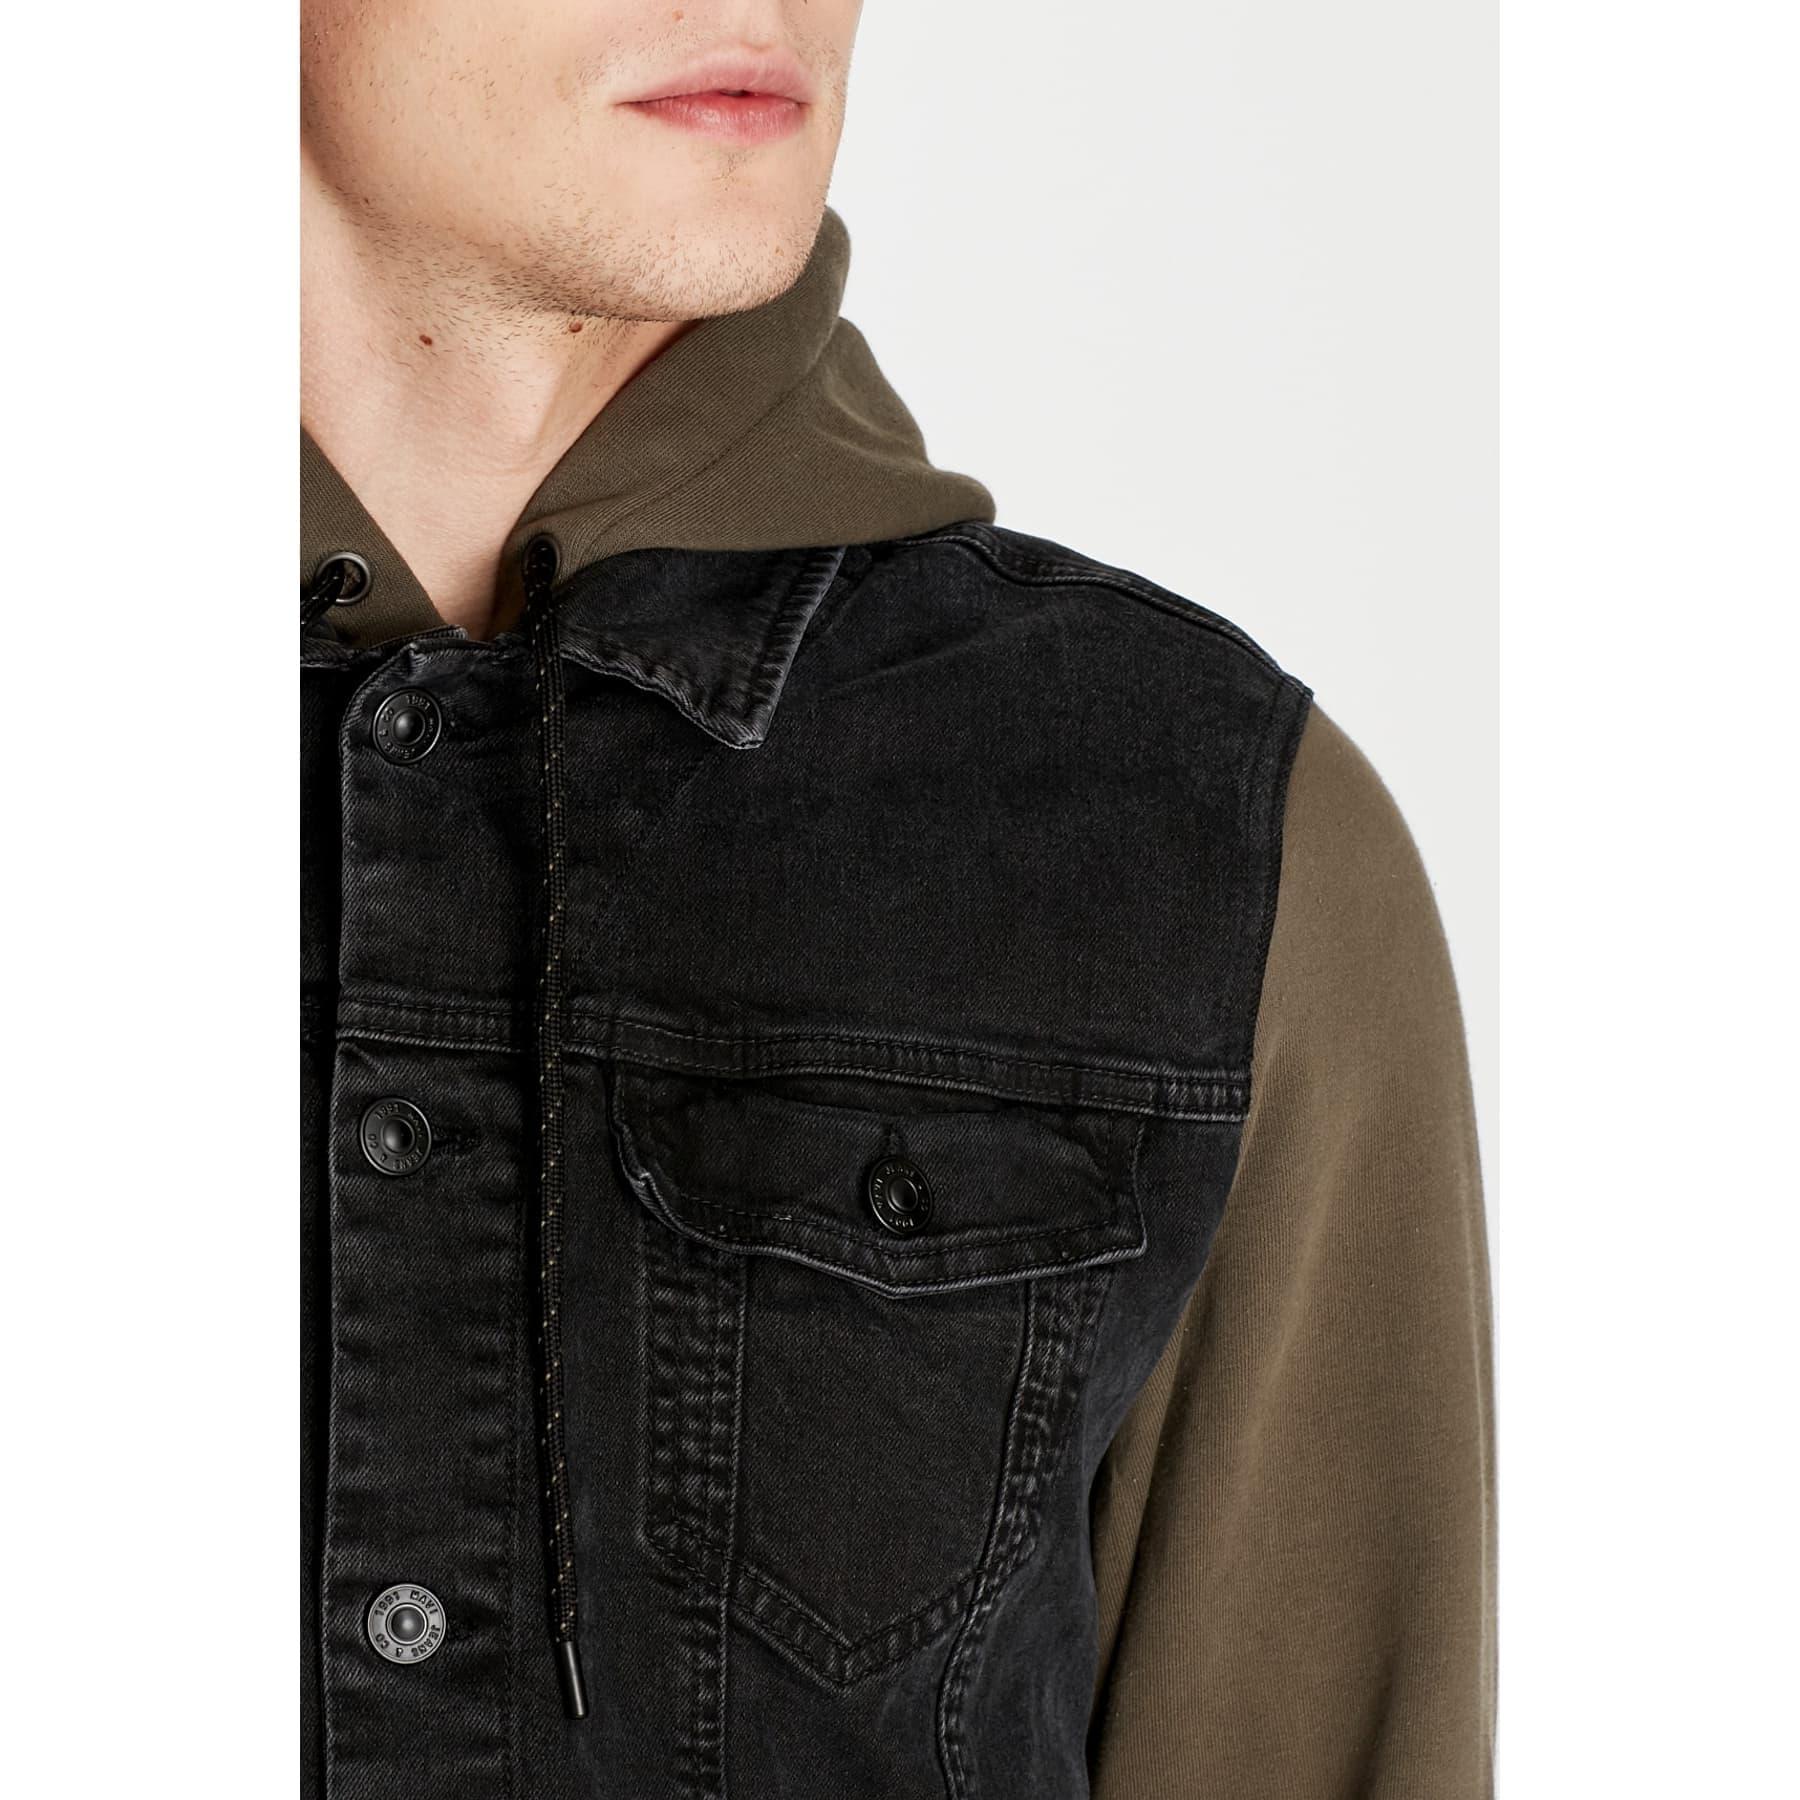 Sam Black Pro Erkek Jean Ceket